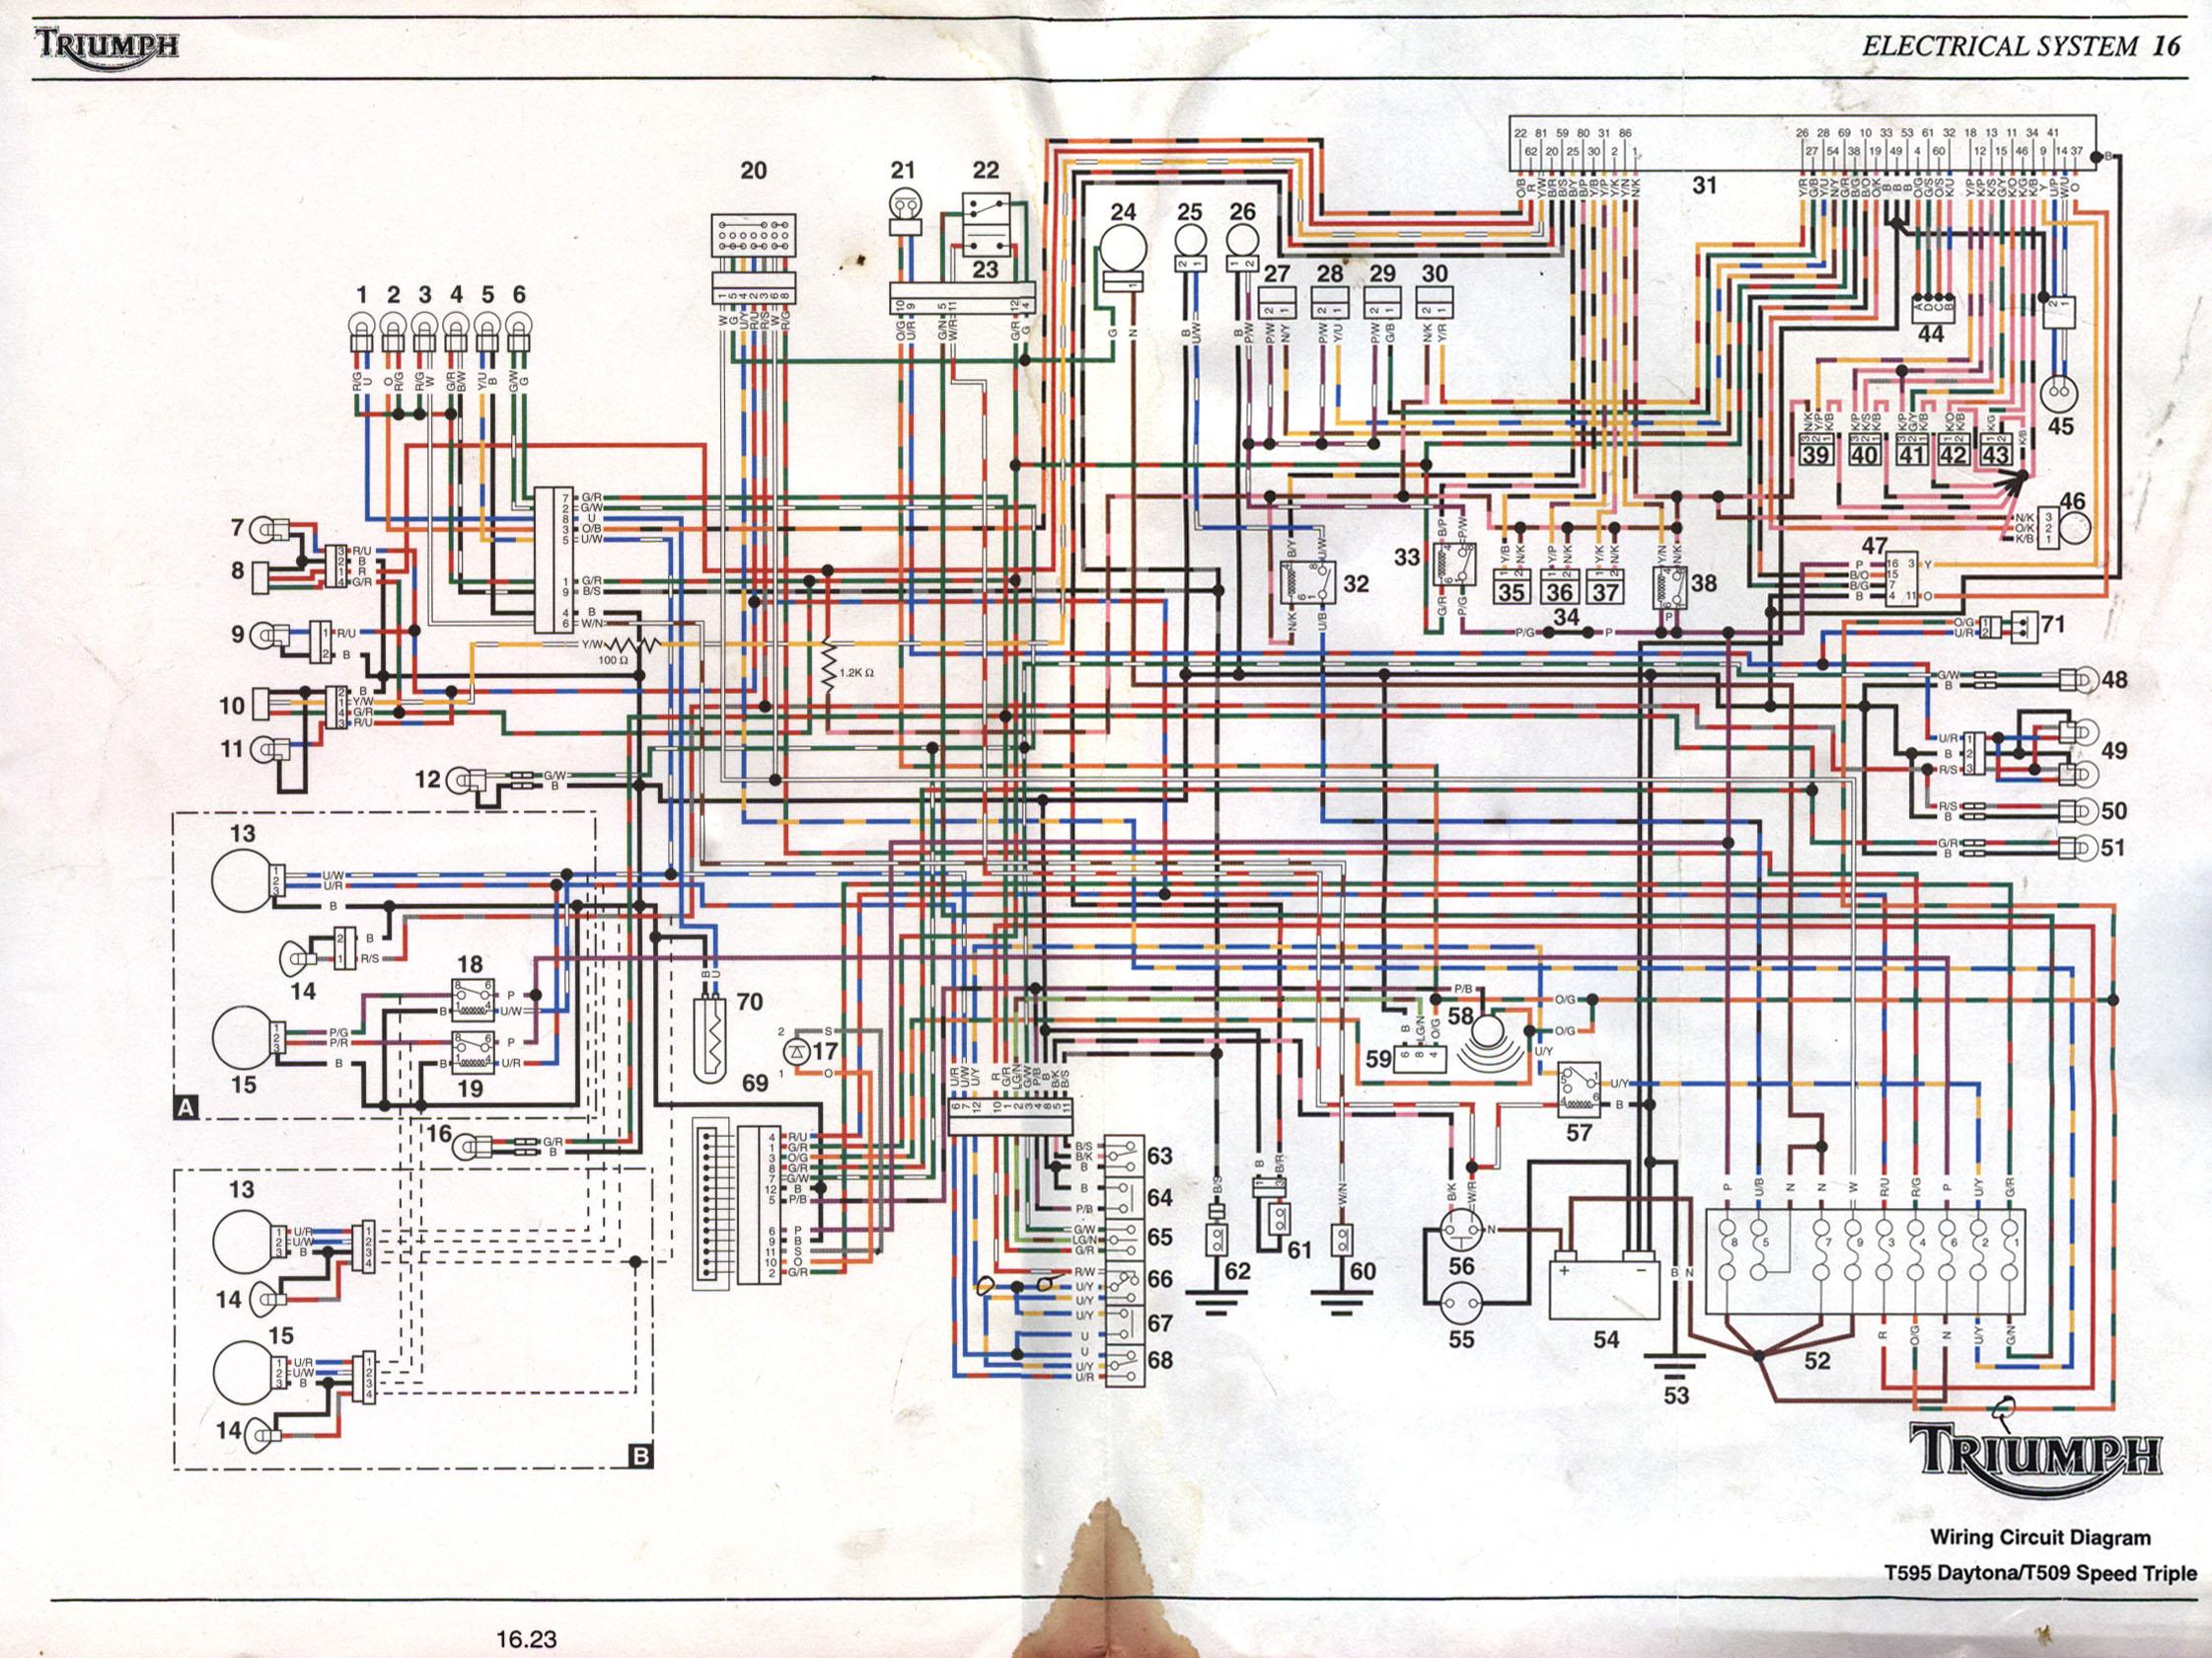 2002 Kawasaki 650 Atv Wiring Diagram Electrical Diagrams 220 1996 Gsxr 1000 Trusted Bayou Engine 750